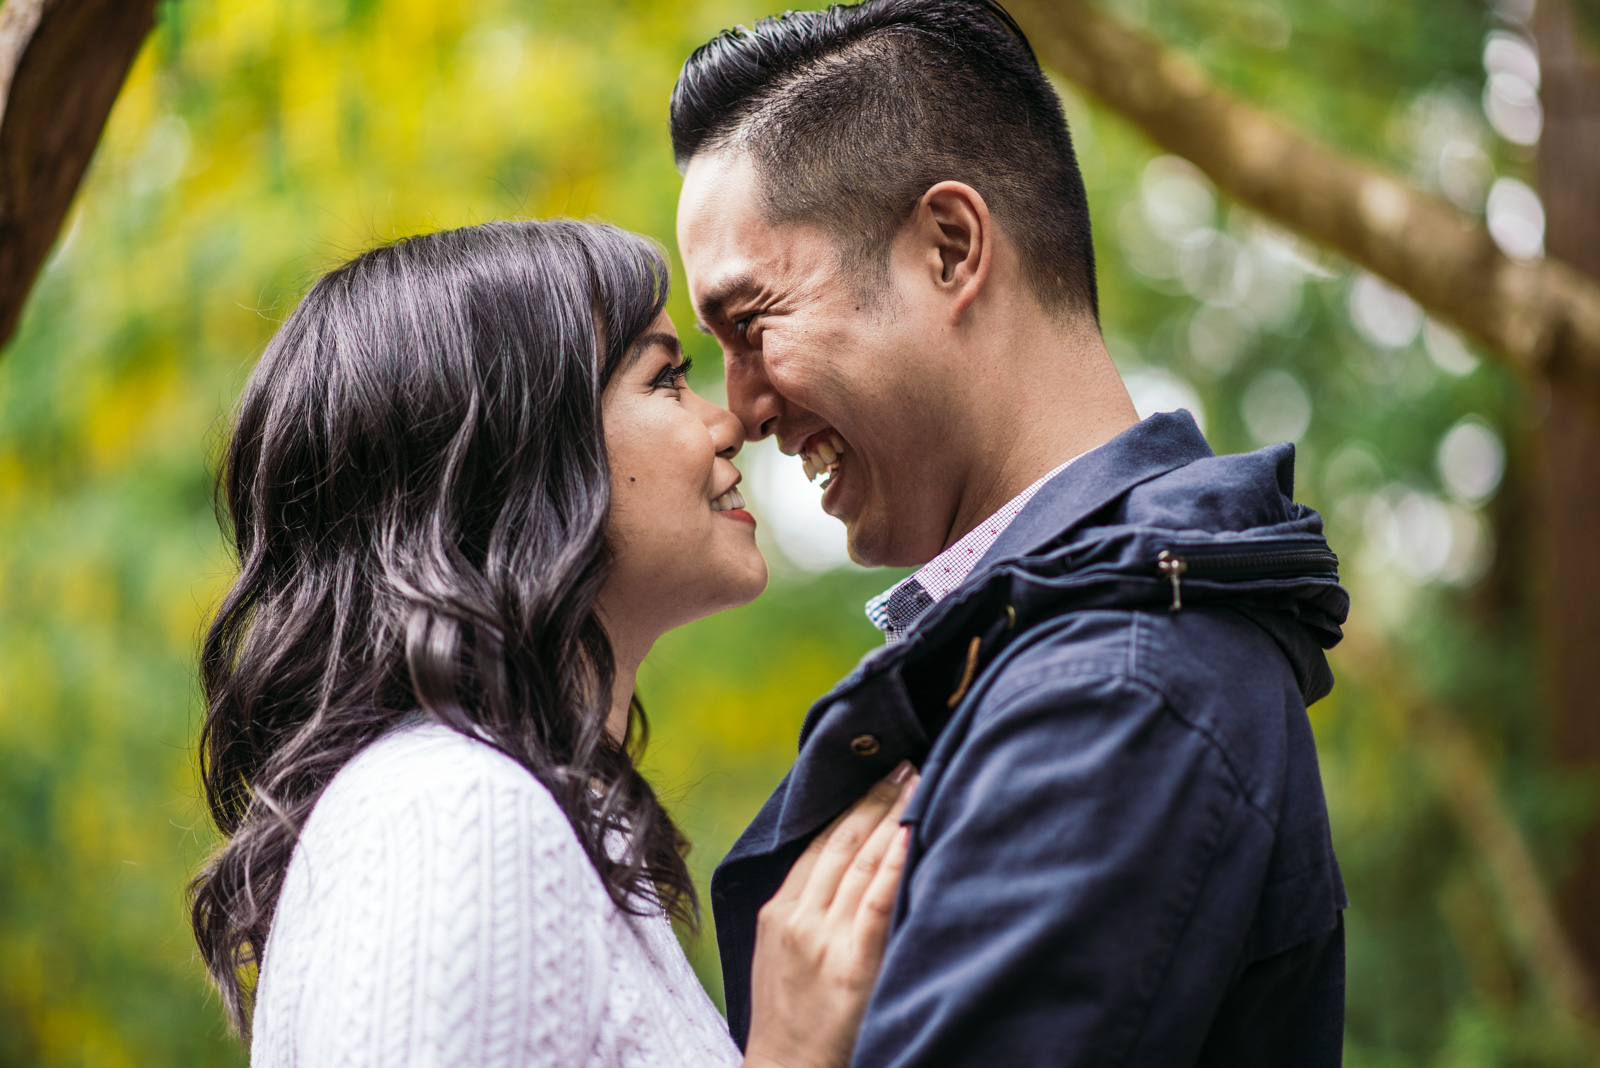 vancouver-island-wedding-photographers-capilano-suspension-bridge-engagement-6.jpg